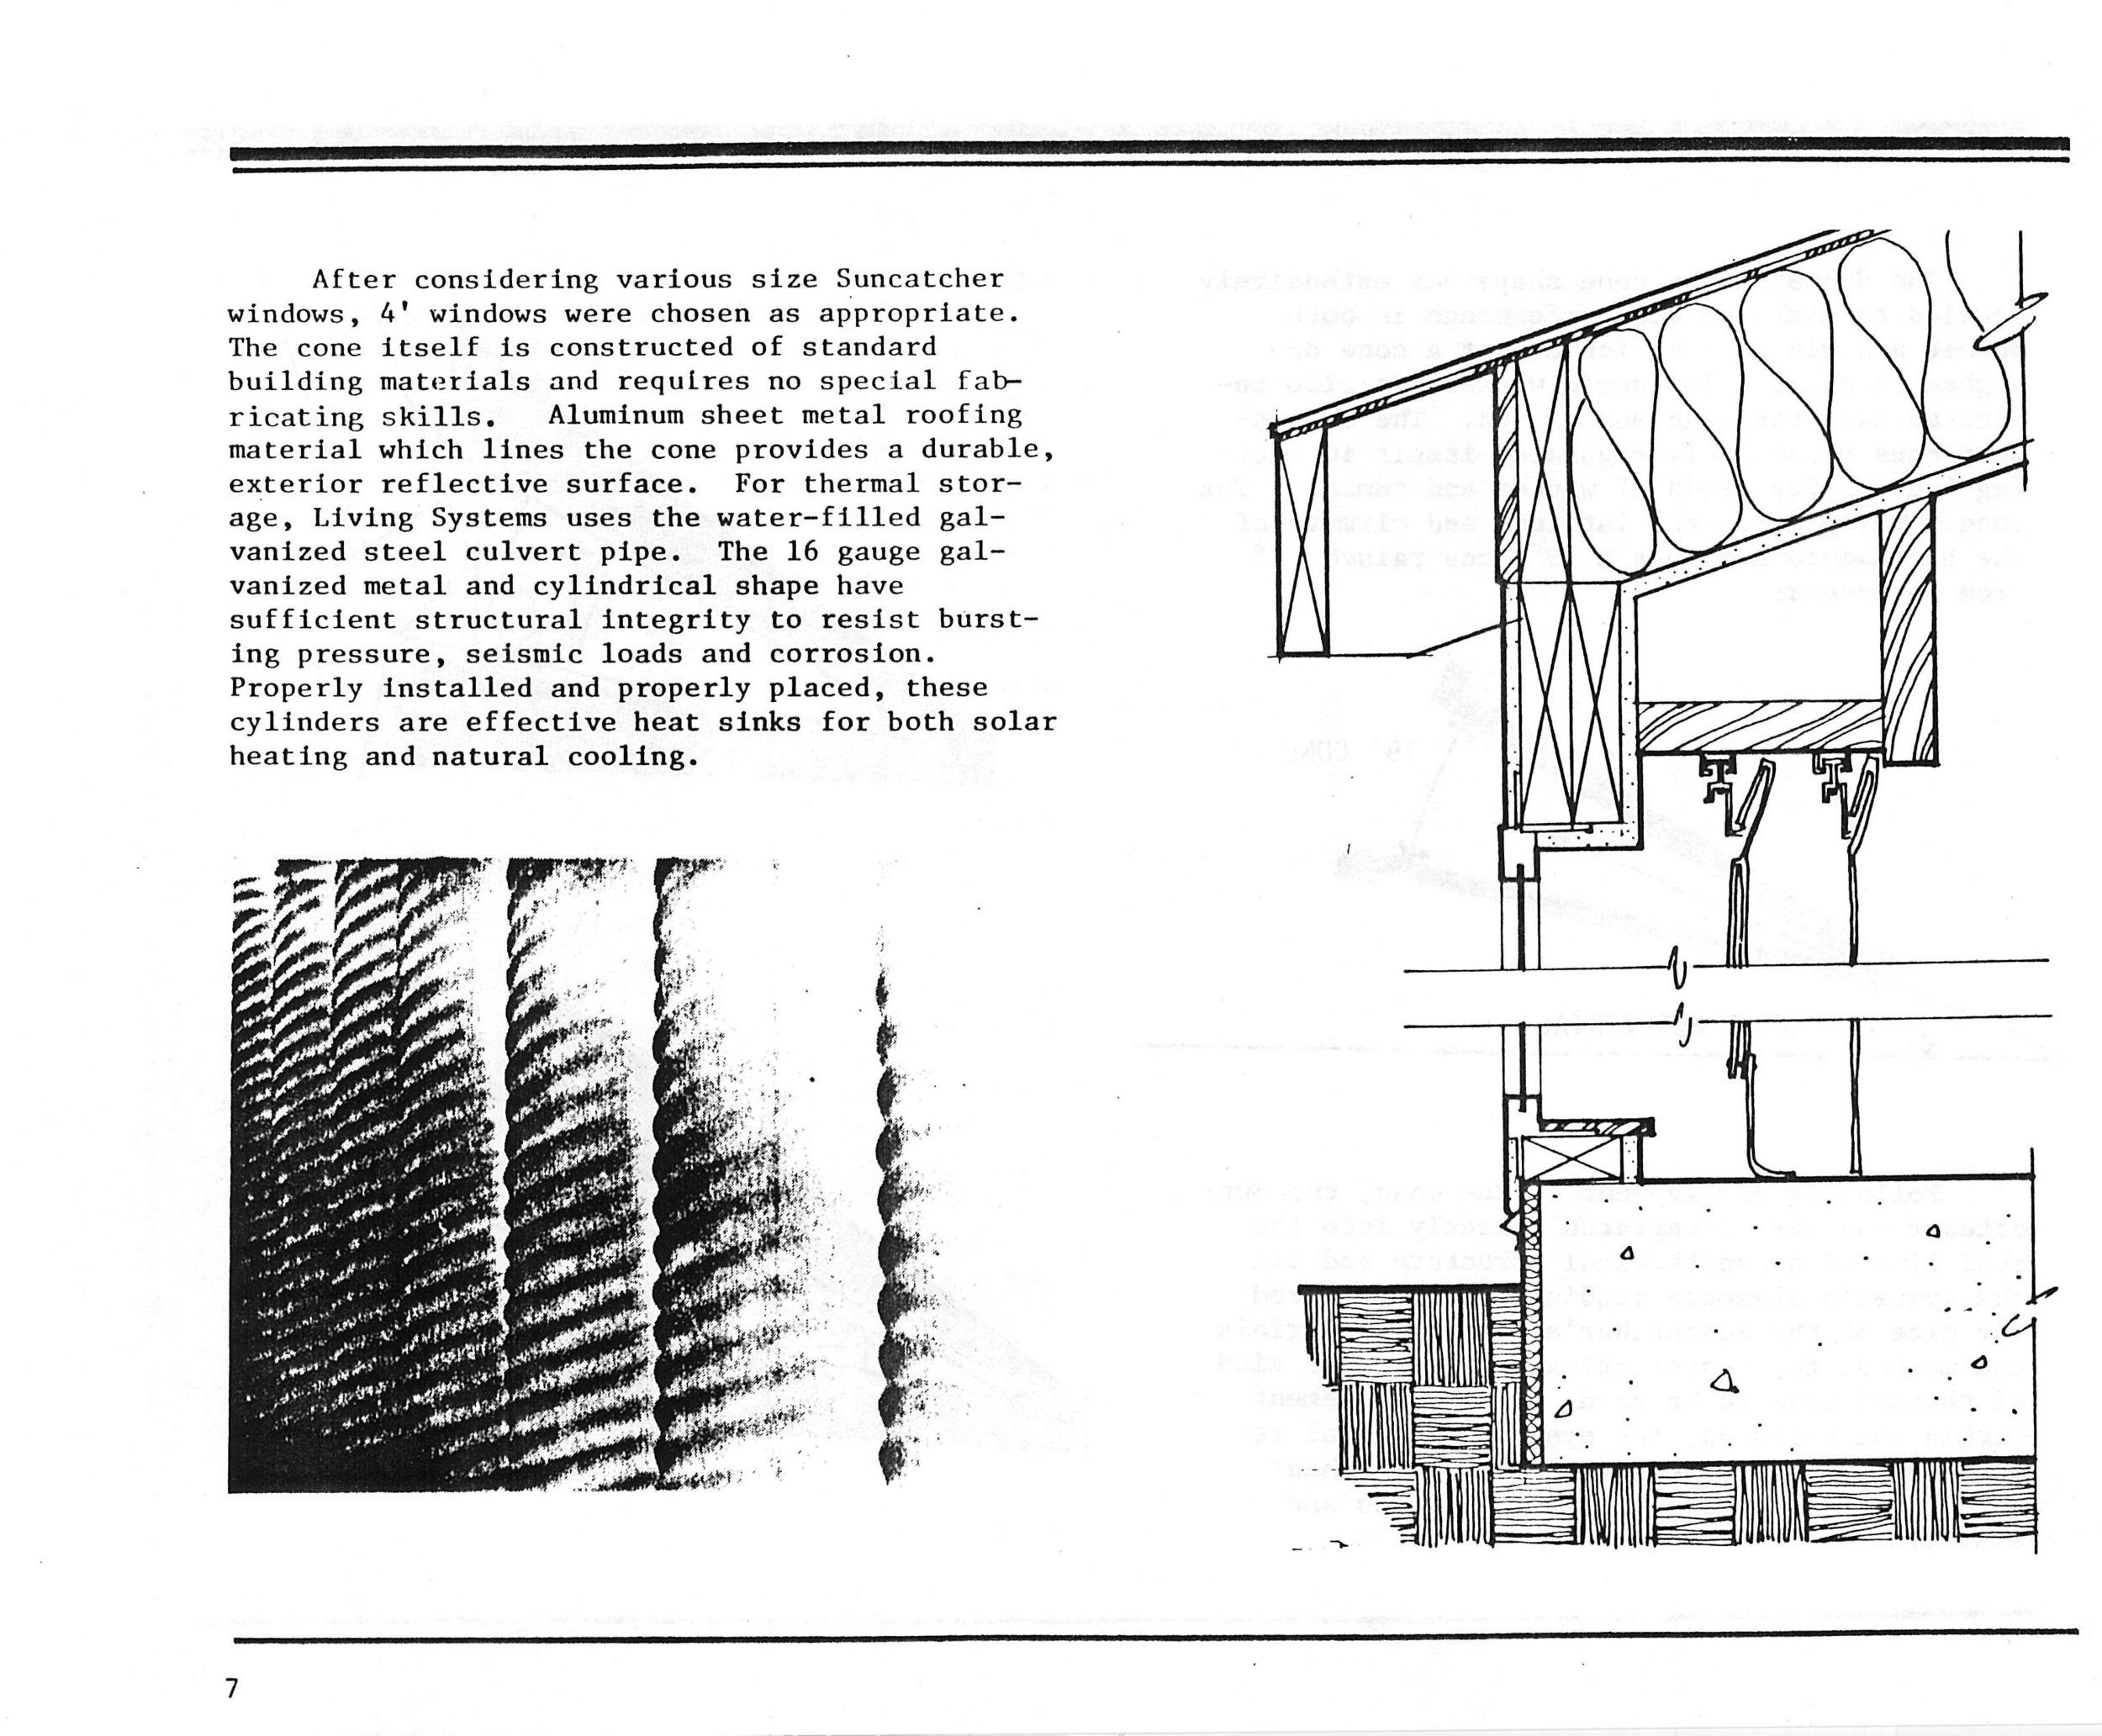 CoolPool-LivingSystems_1981_Page_010.jpg